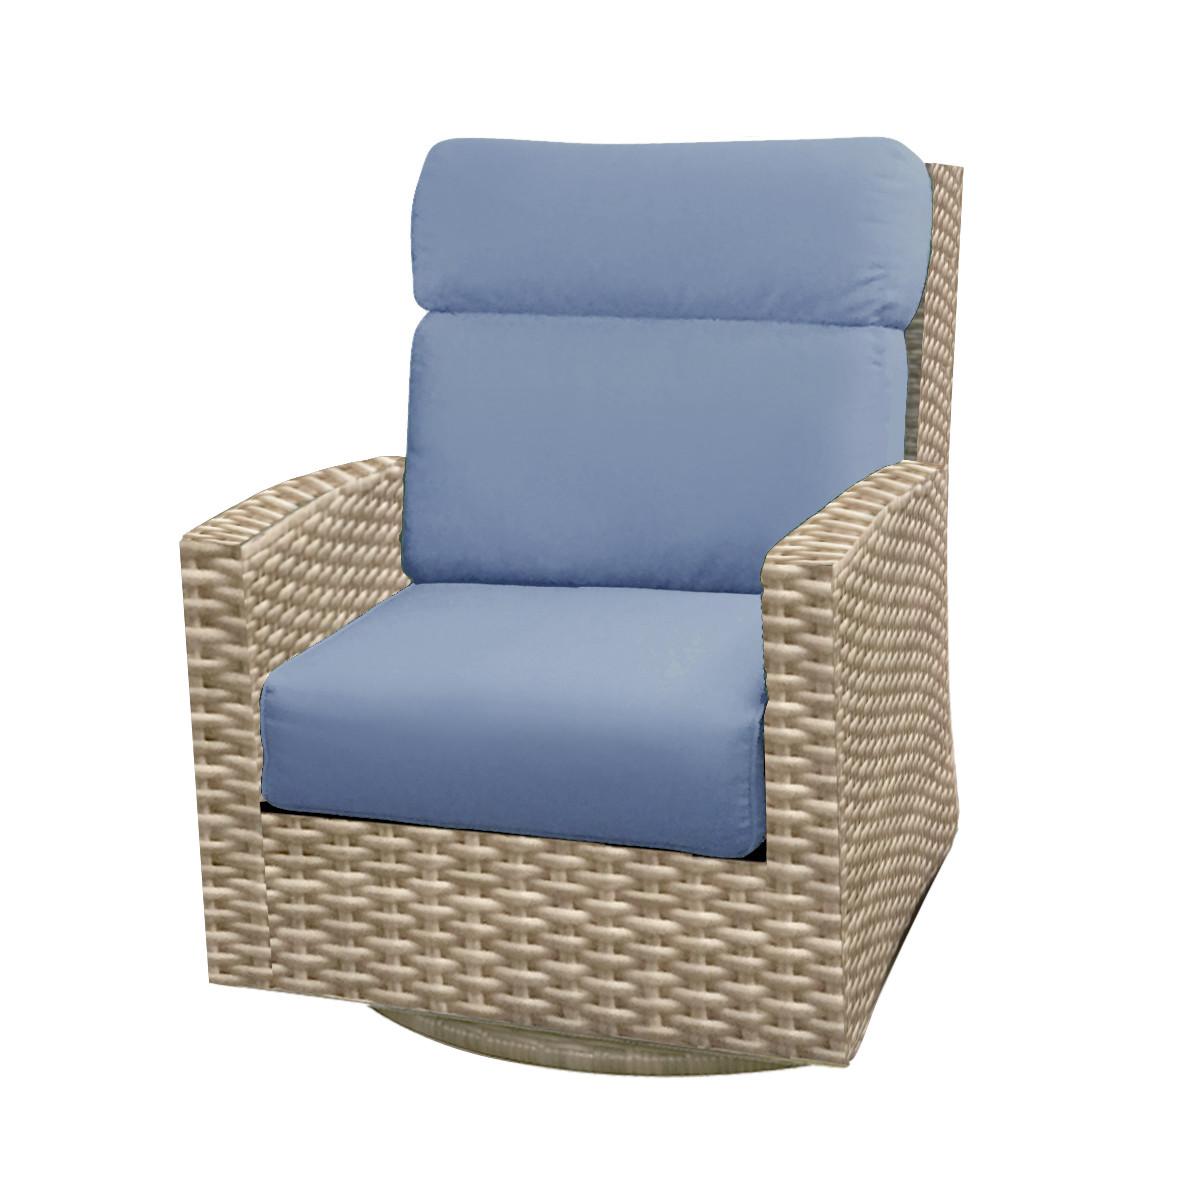 Sensational Forever Patio Cavalier Wicker High Back Swivel Rocker Chair By Northcape International Machost Co Dining Chair Design Ideas Machostcouk